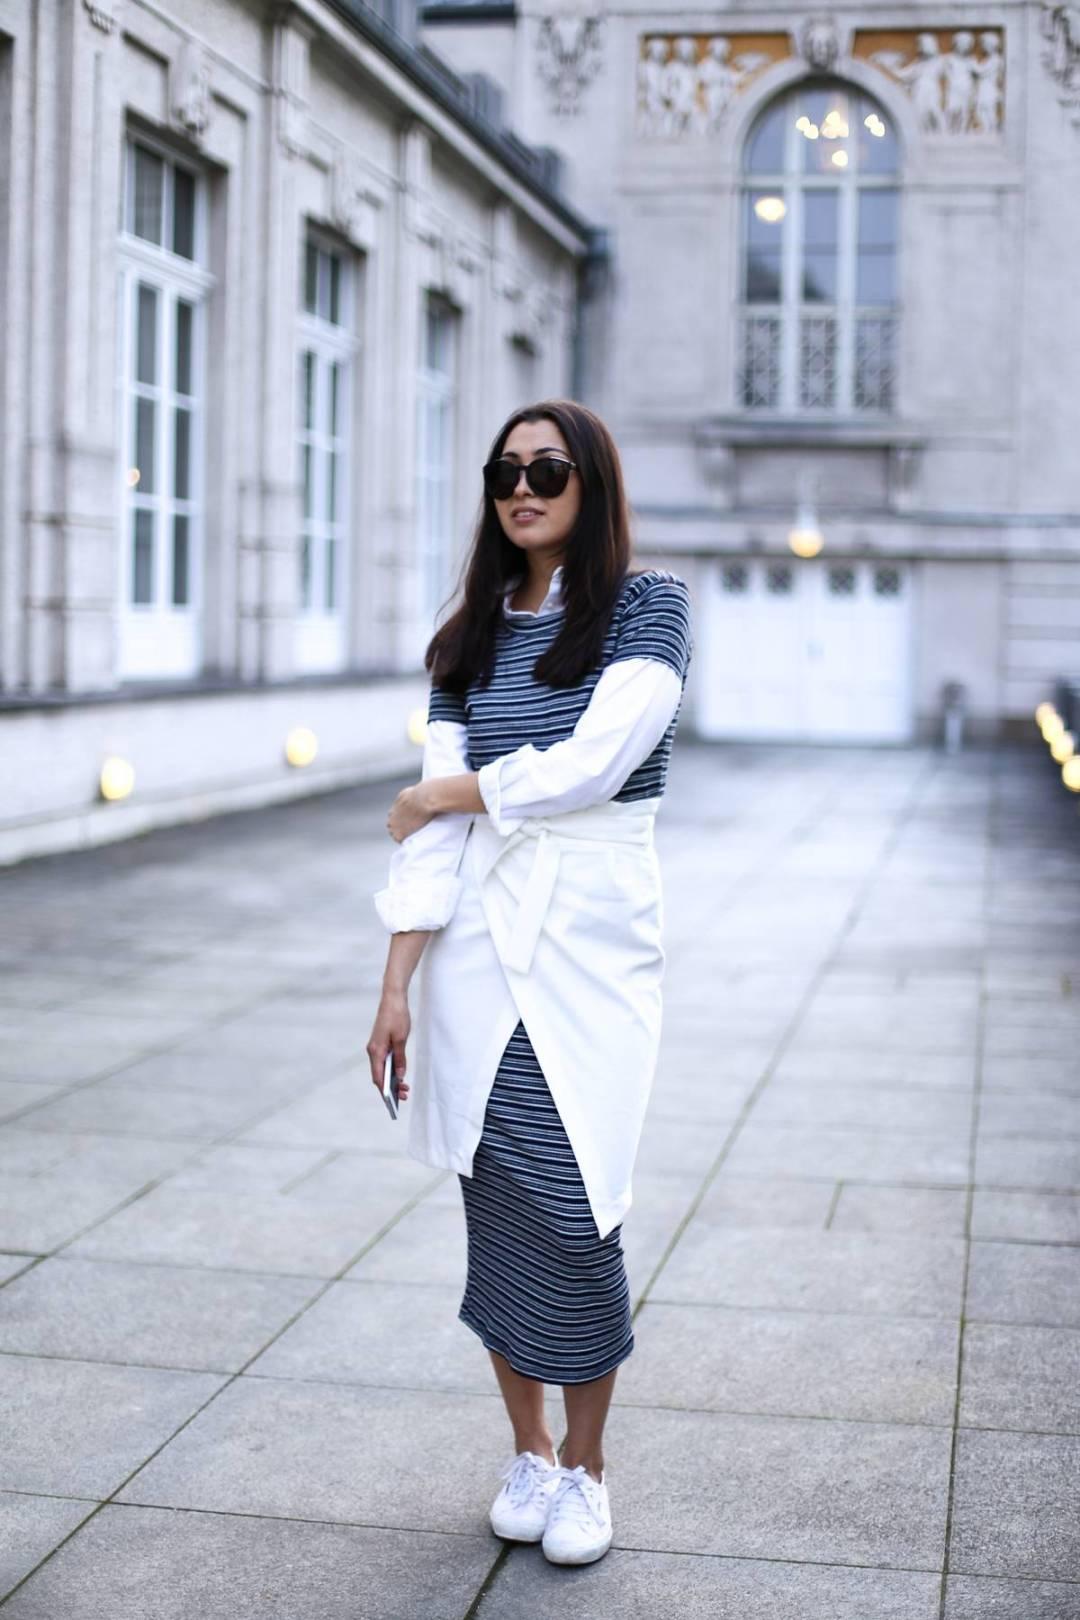 Stripes - Midi Dress - Zara - Casual - Ootd - Streetstyle Munich - German Fashionblog - White Sneaker - Calvin Klein Sunnies - Layering - Prinzregentenplatz